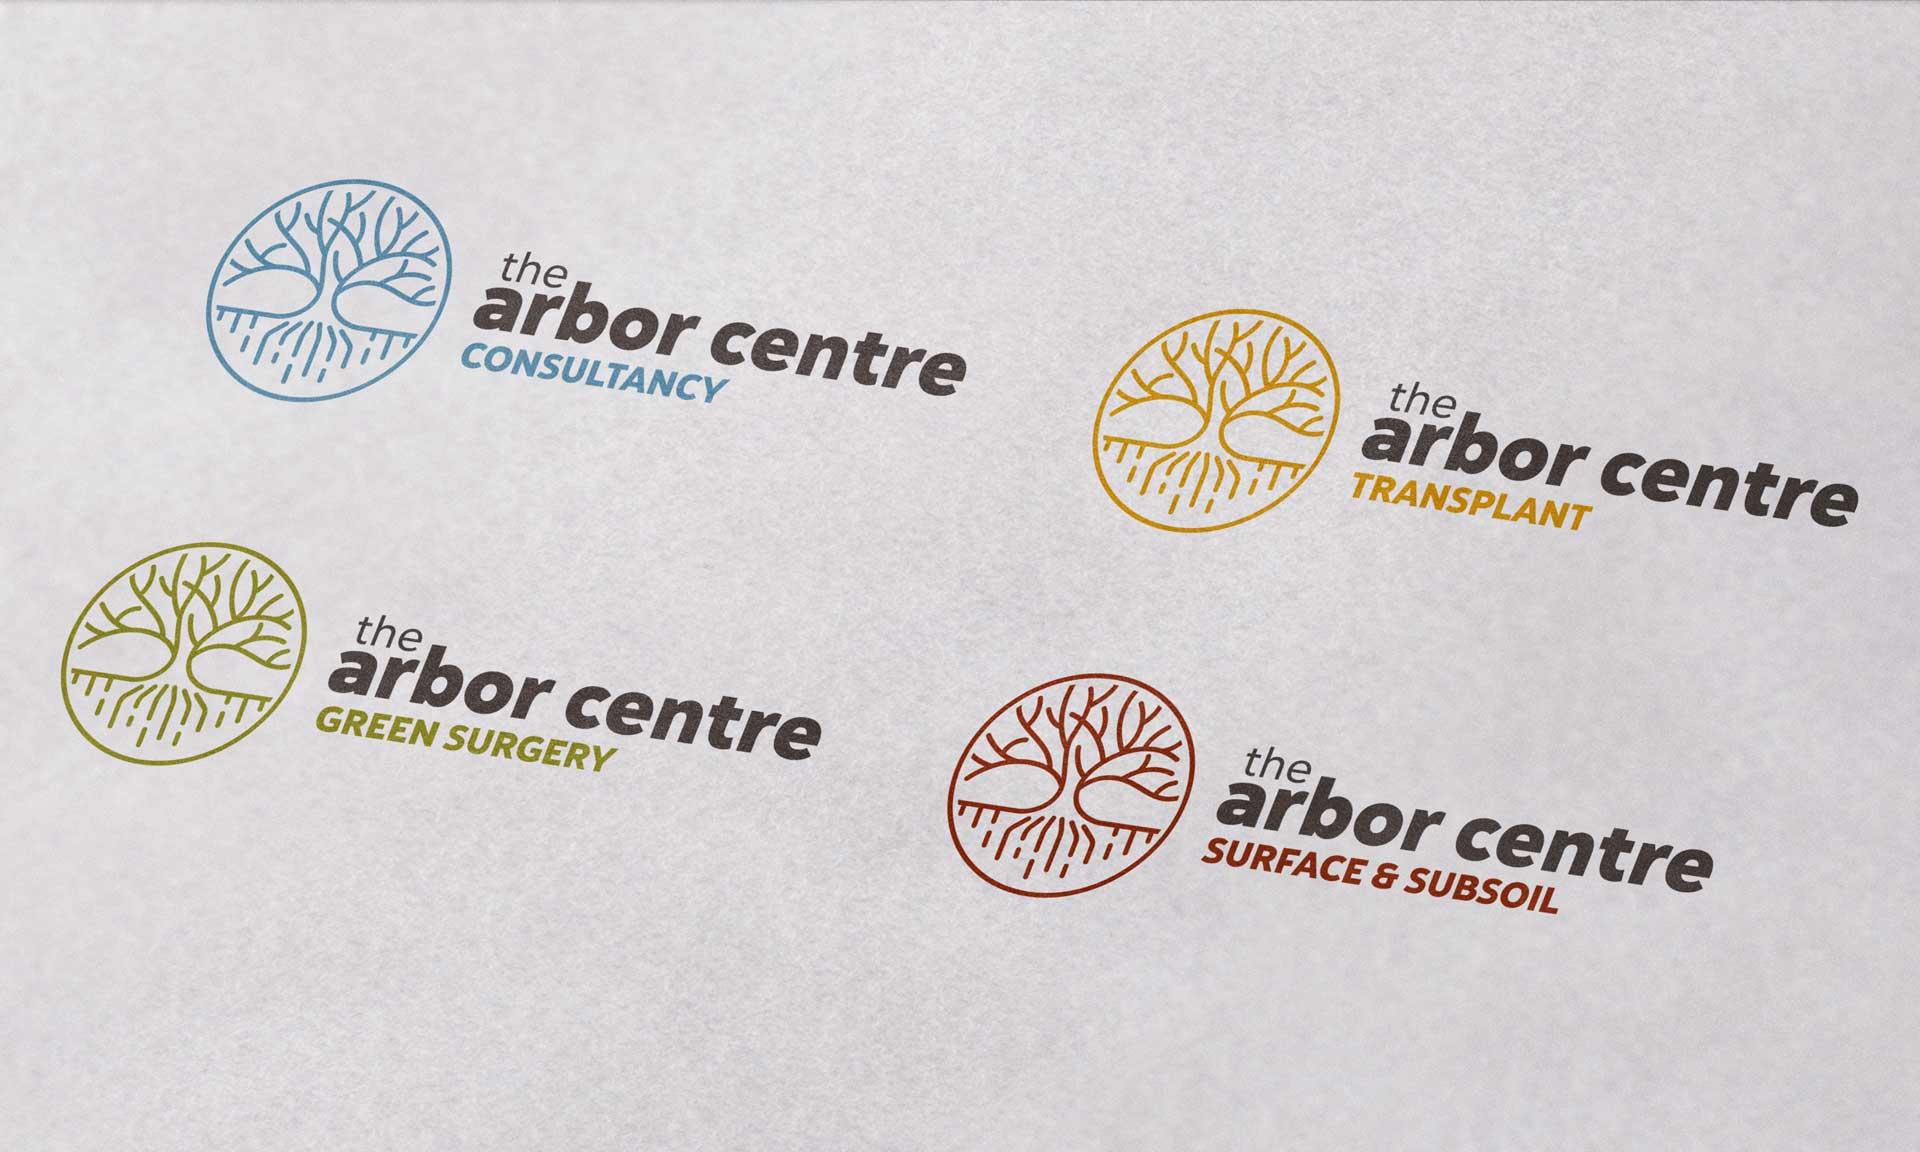 sub_brand_logos-arbor_centre.jpg